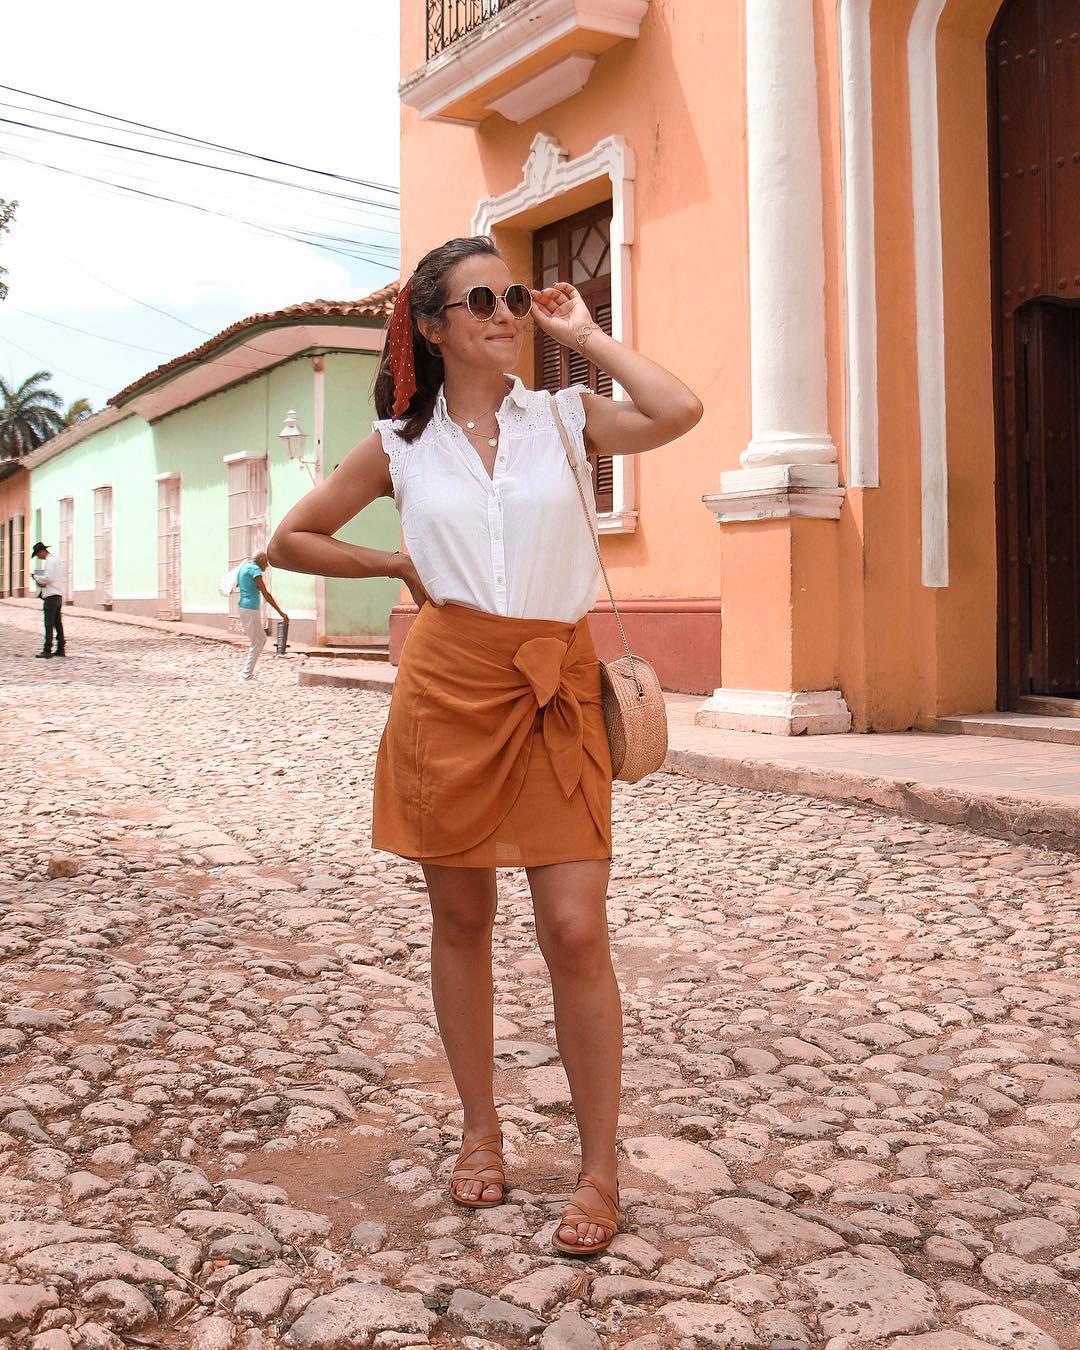 natural strap leather flat sandals de Zara sur lesbonheursdecamille